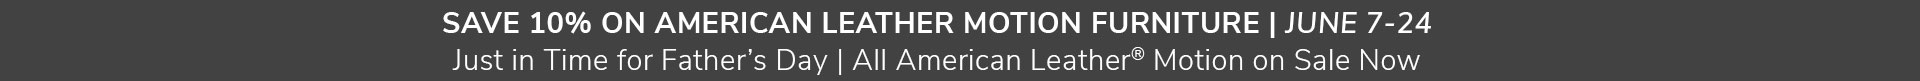 motion-sale-promo-banner.jpg